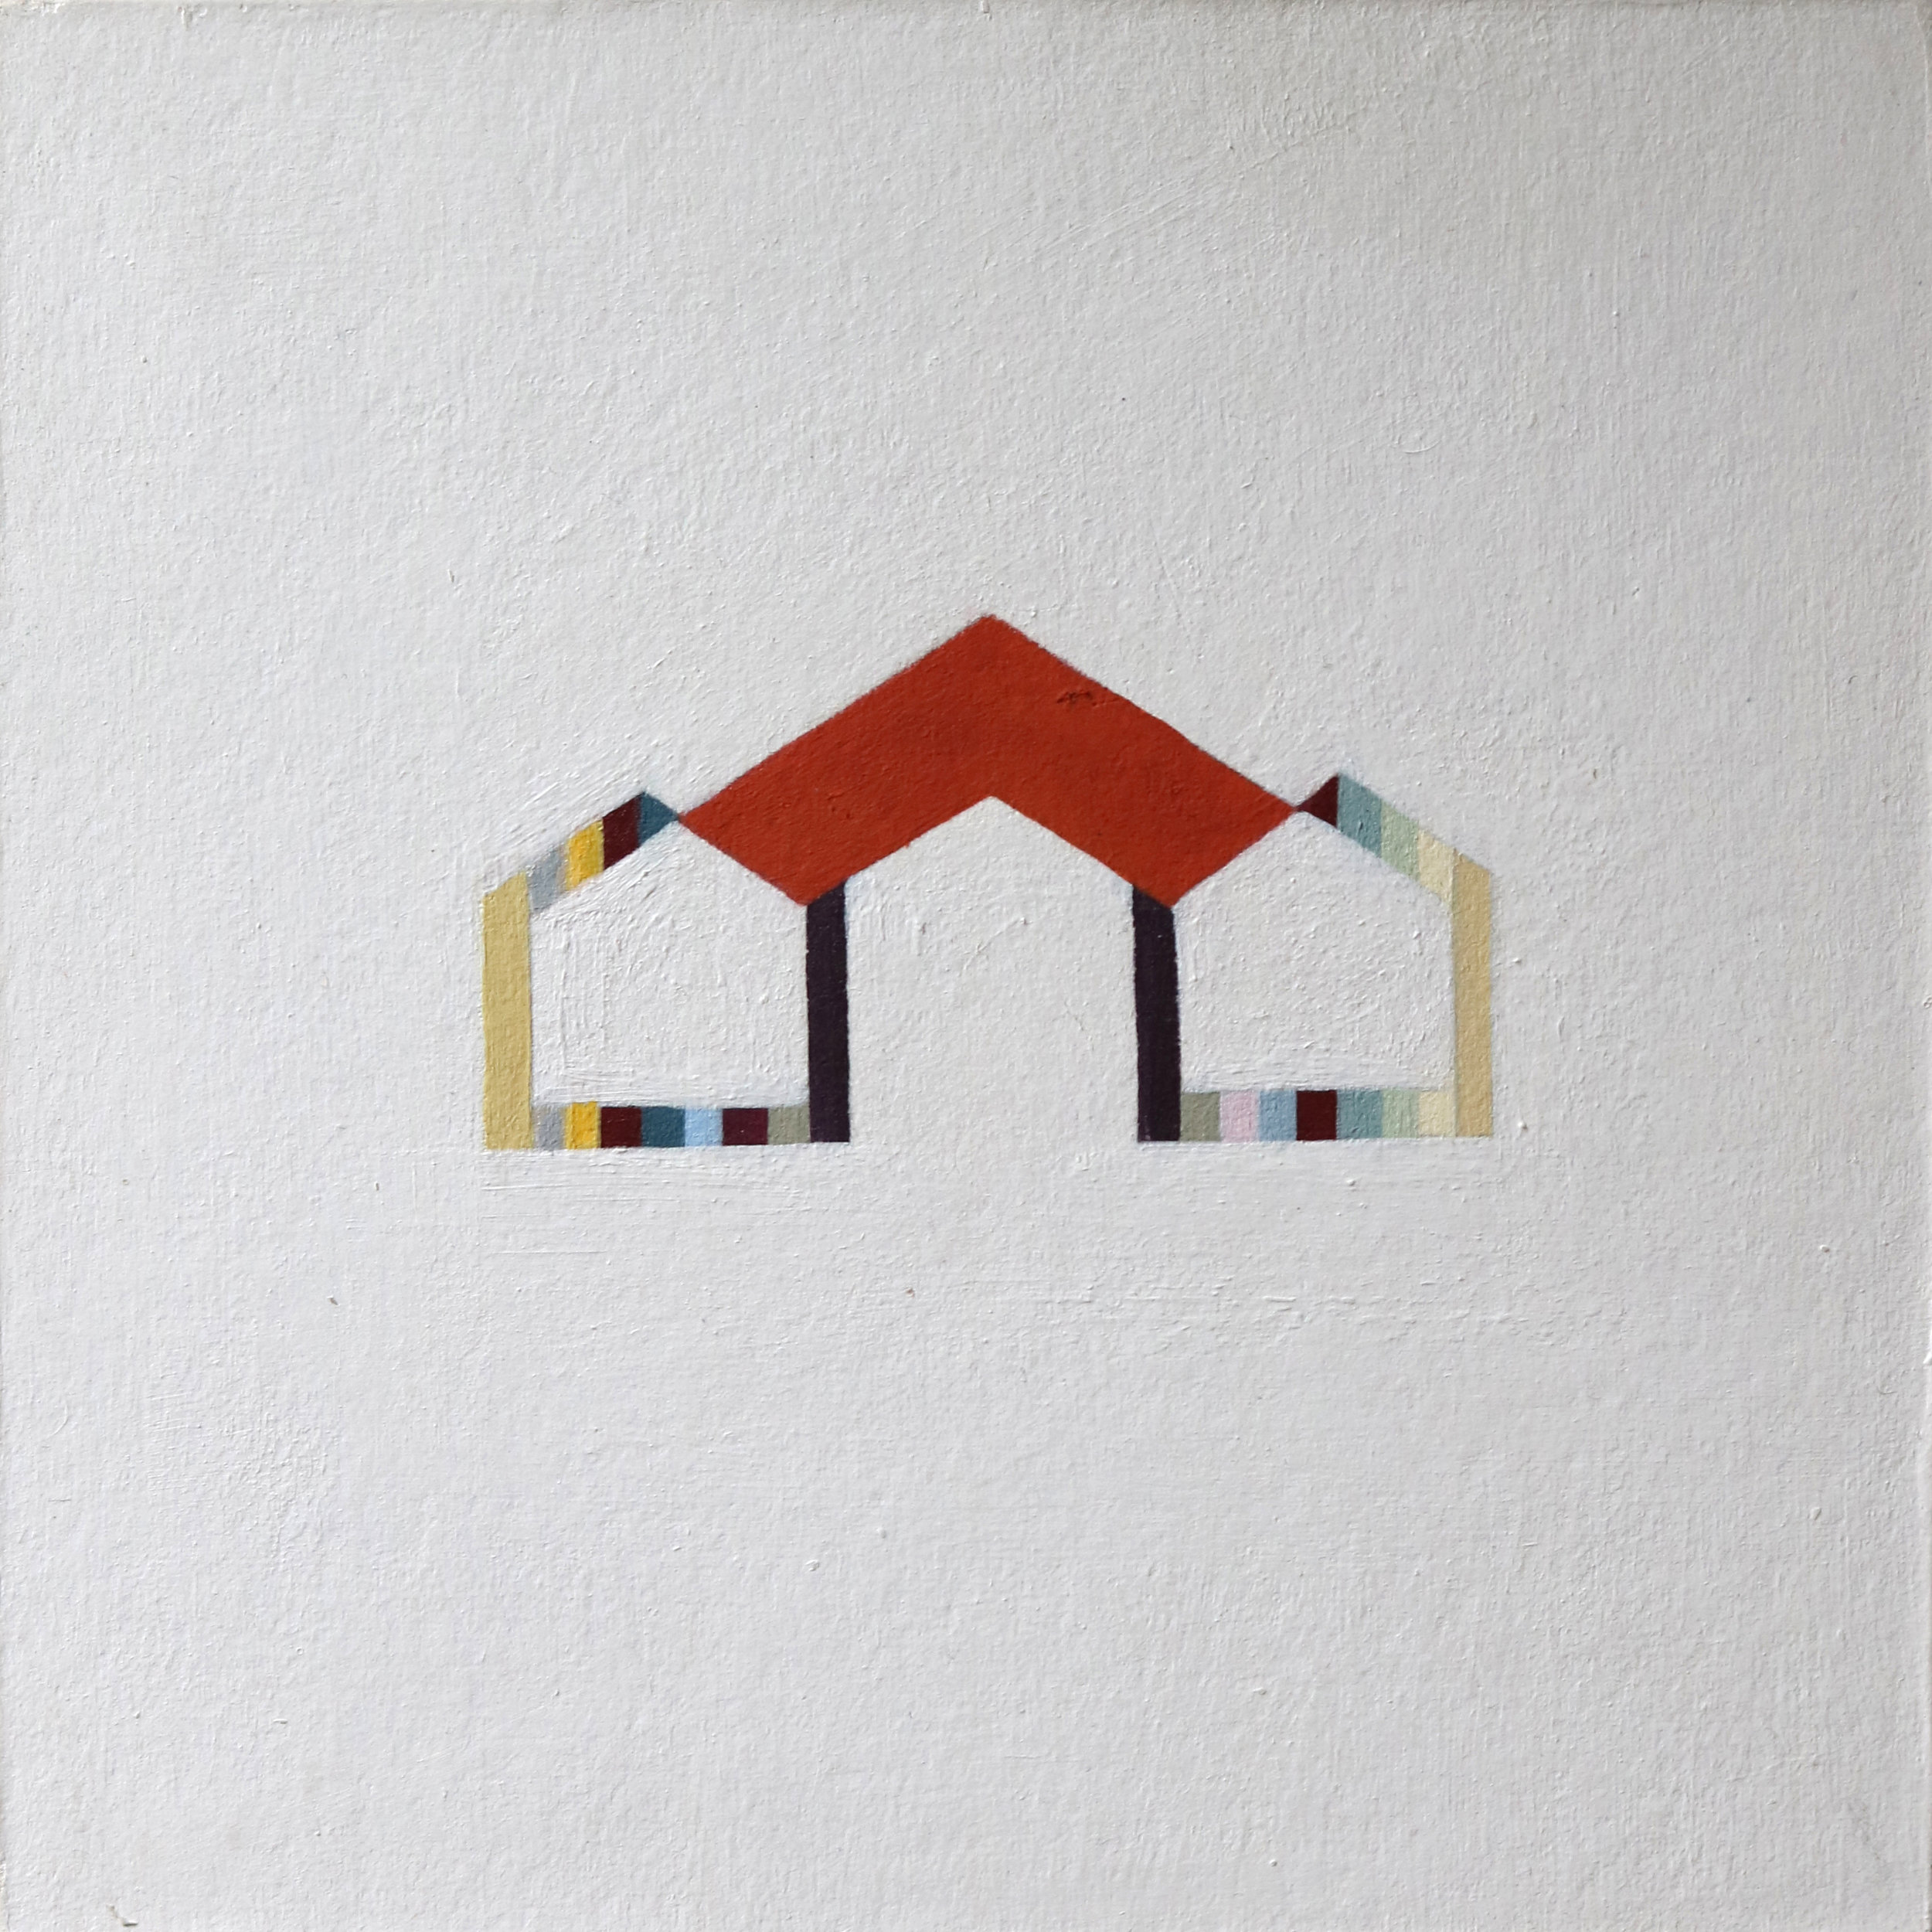 House # 52